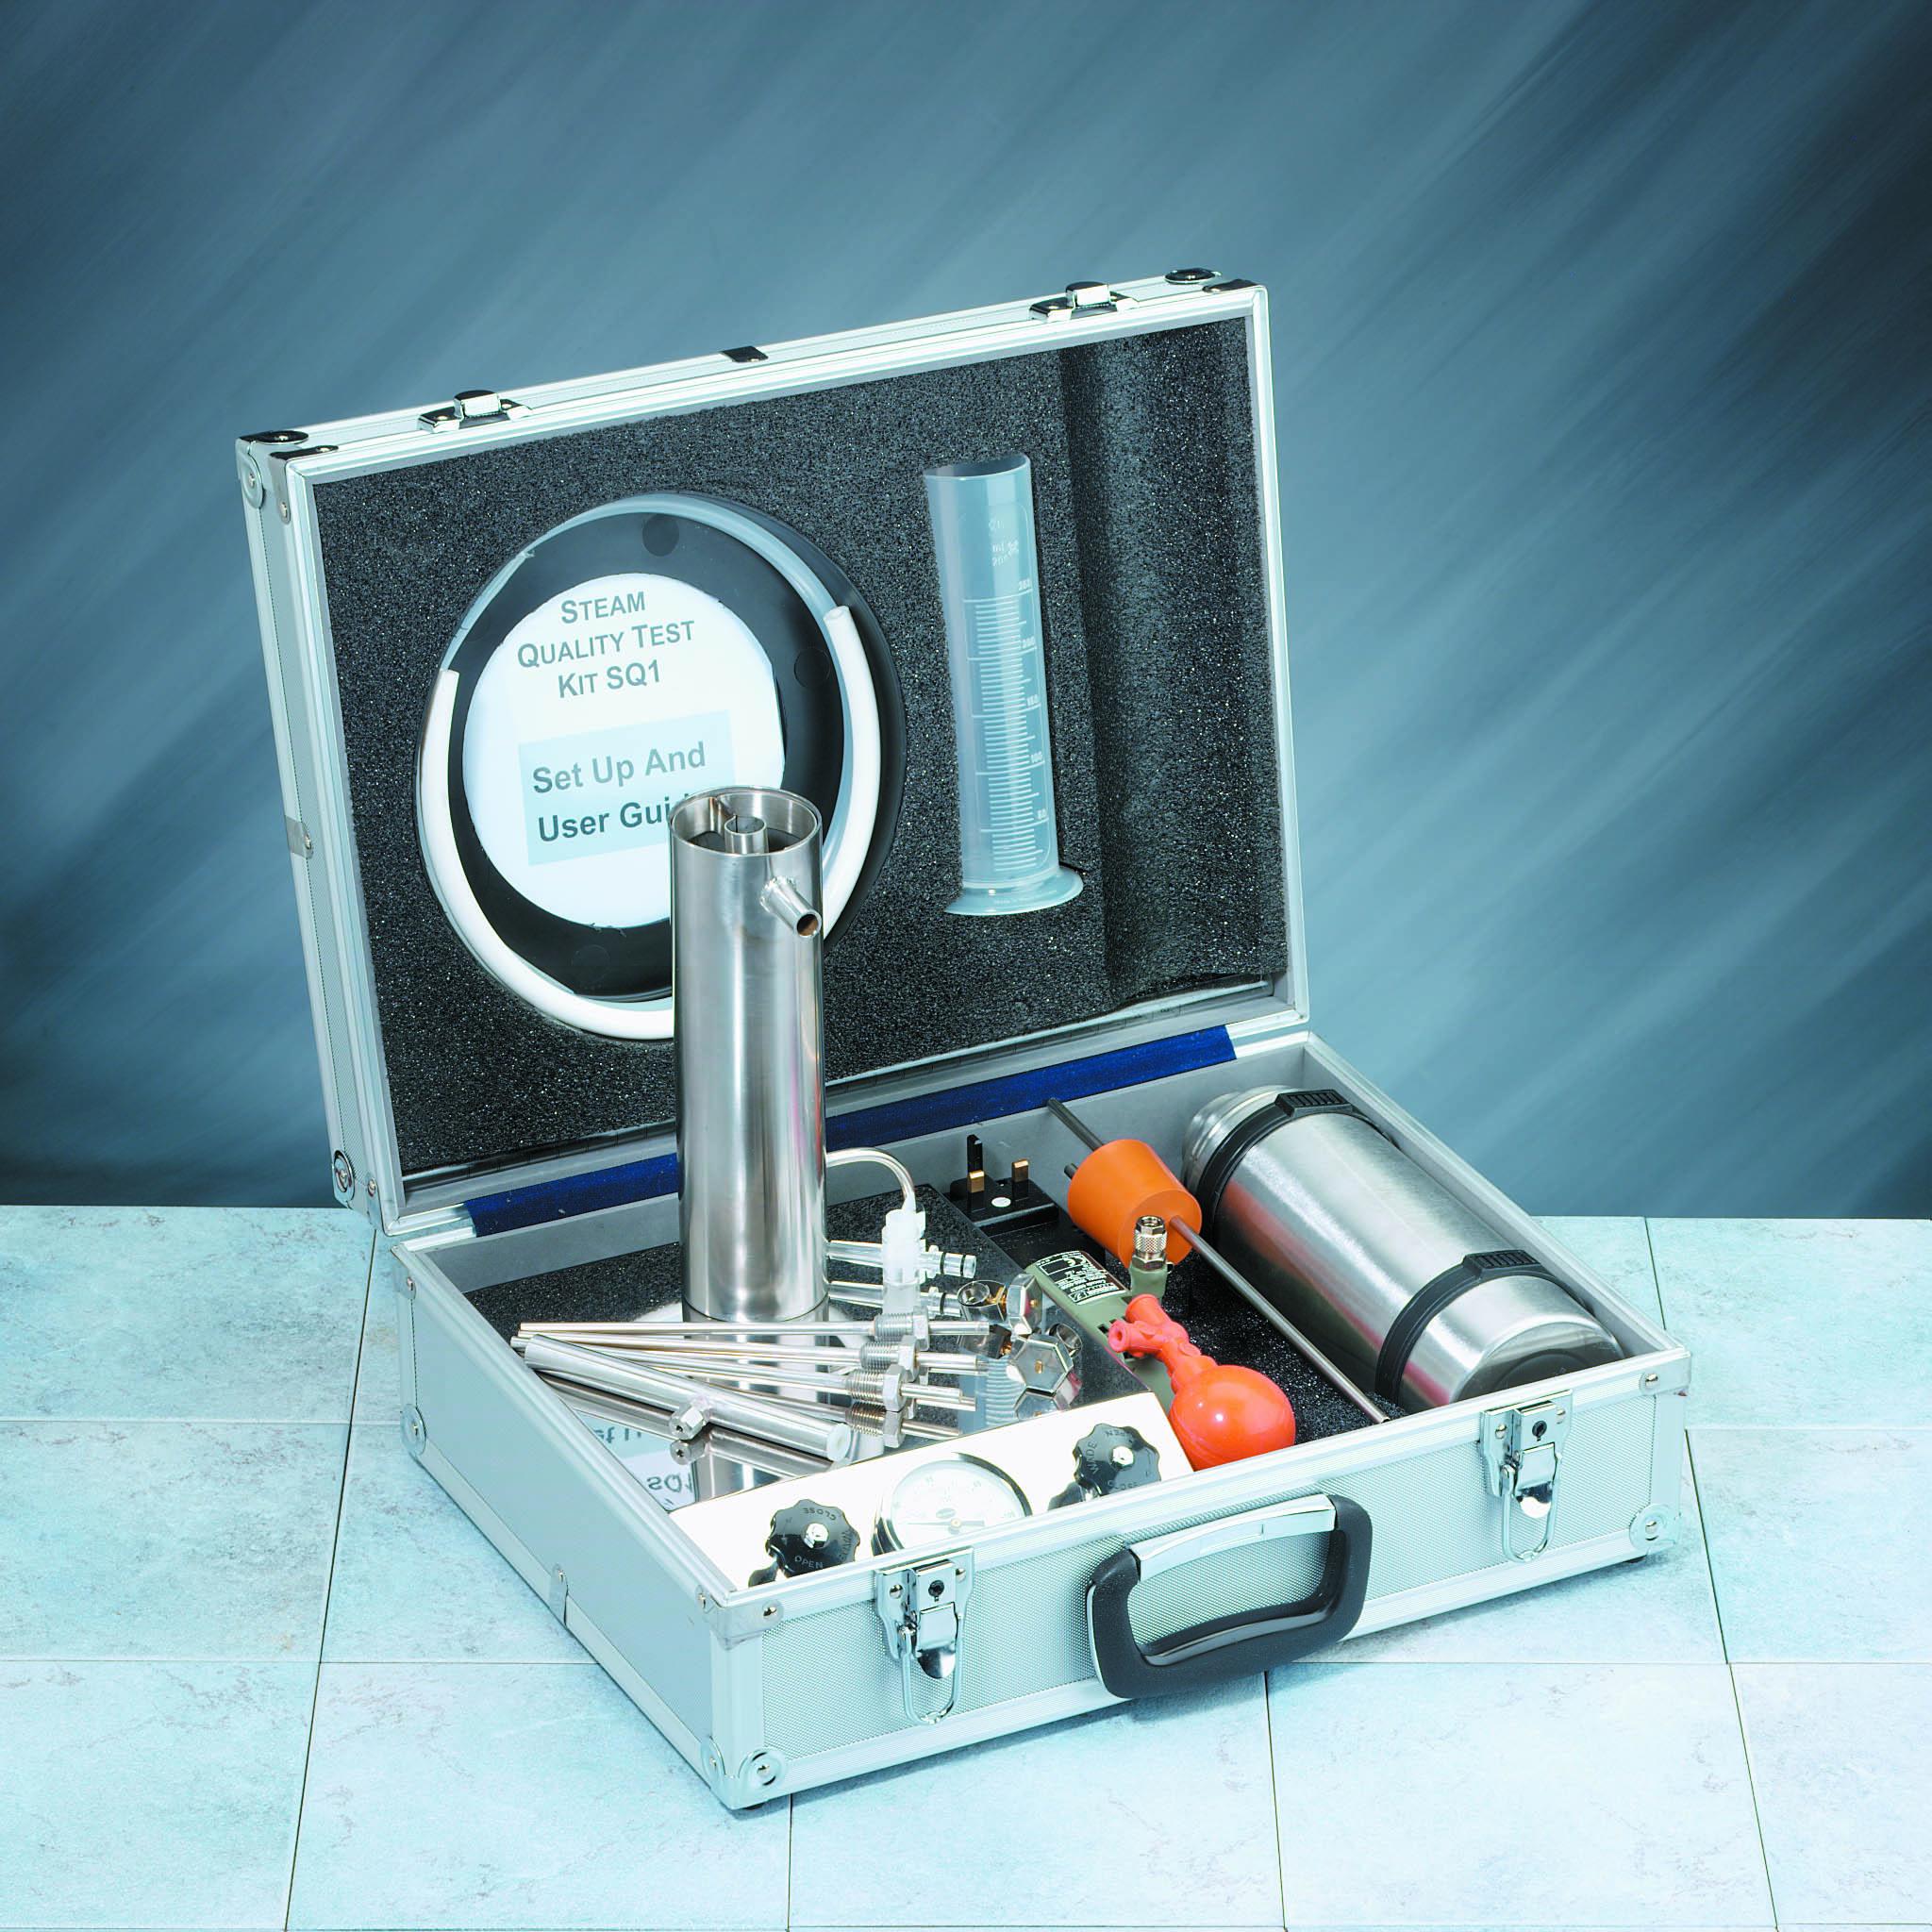 Sq1 h healthcare sq test kits carltex inc test kit 1betcityfo Images